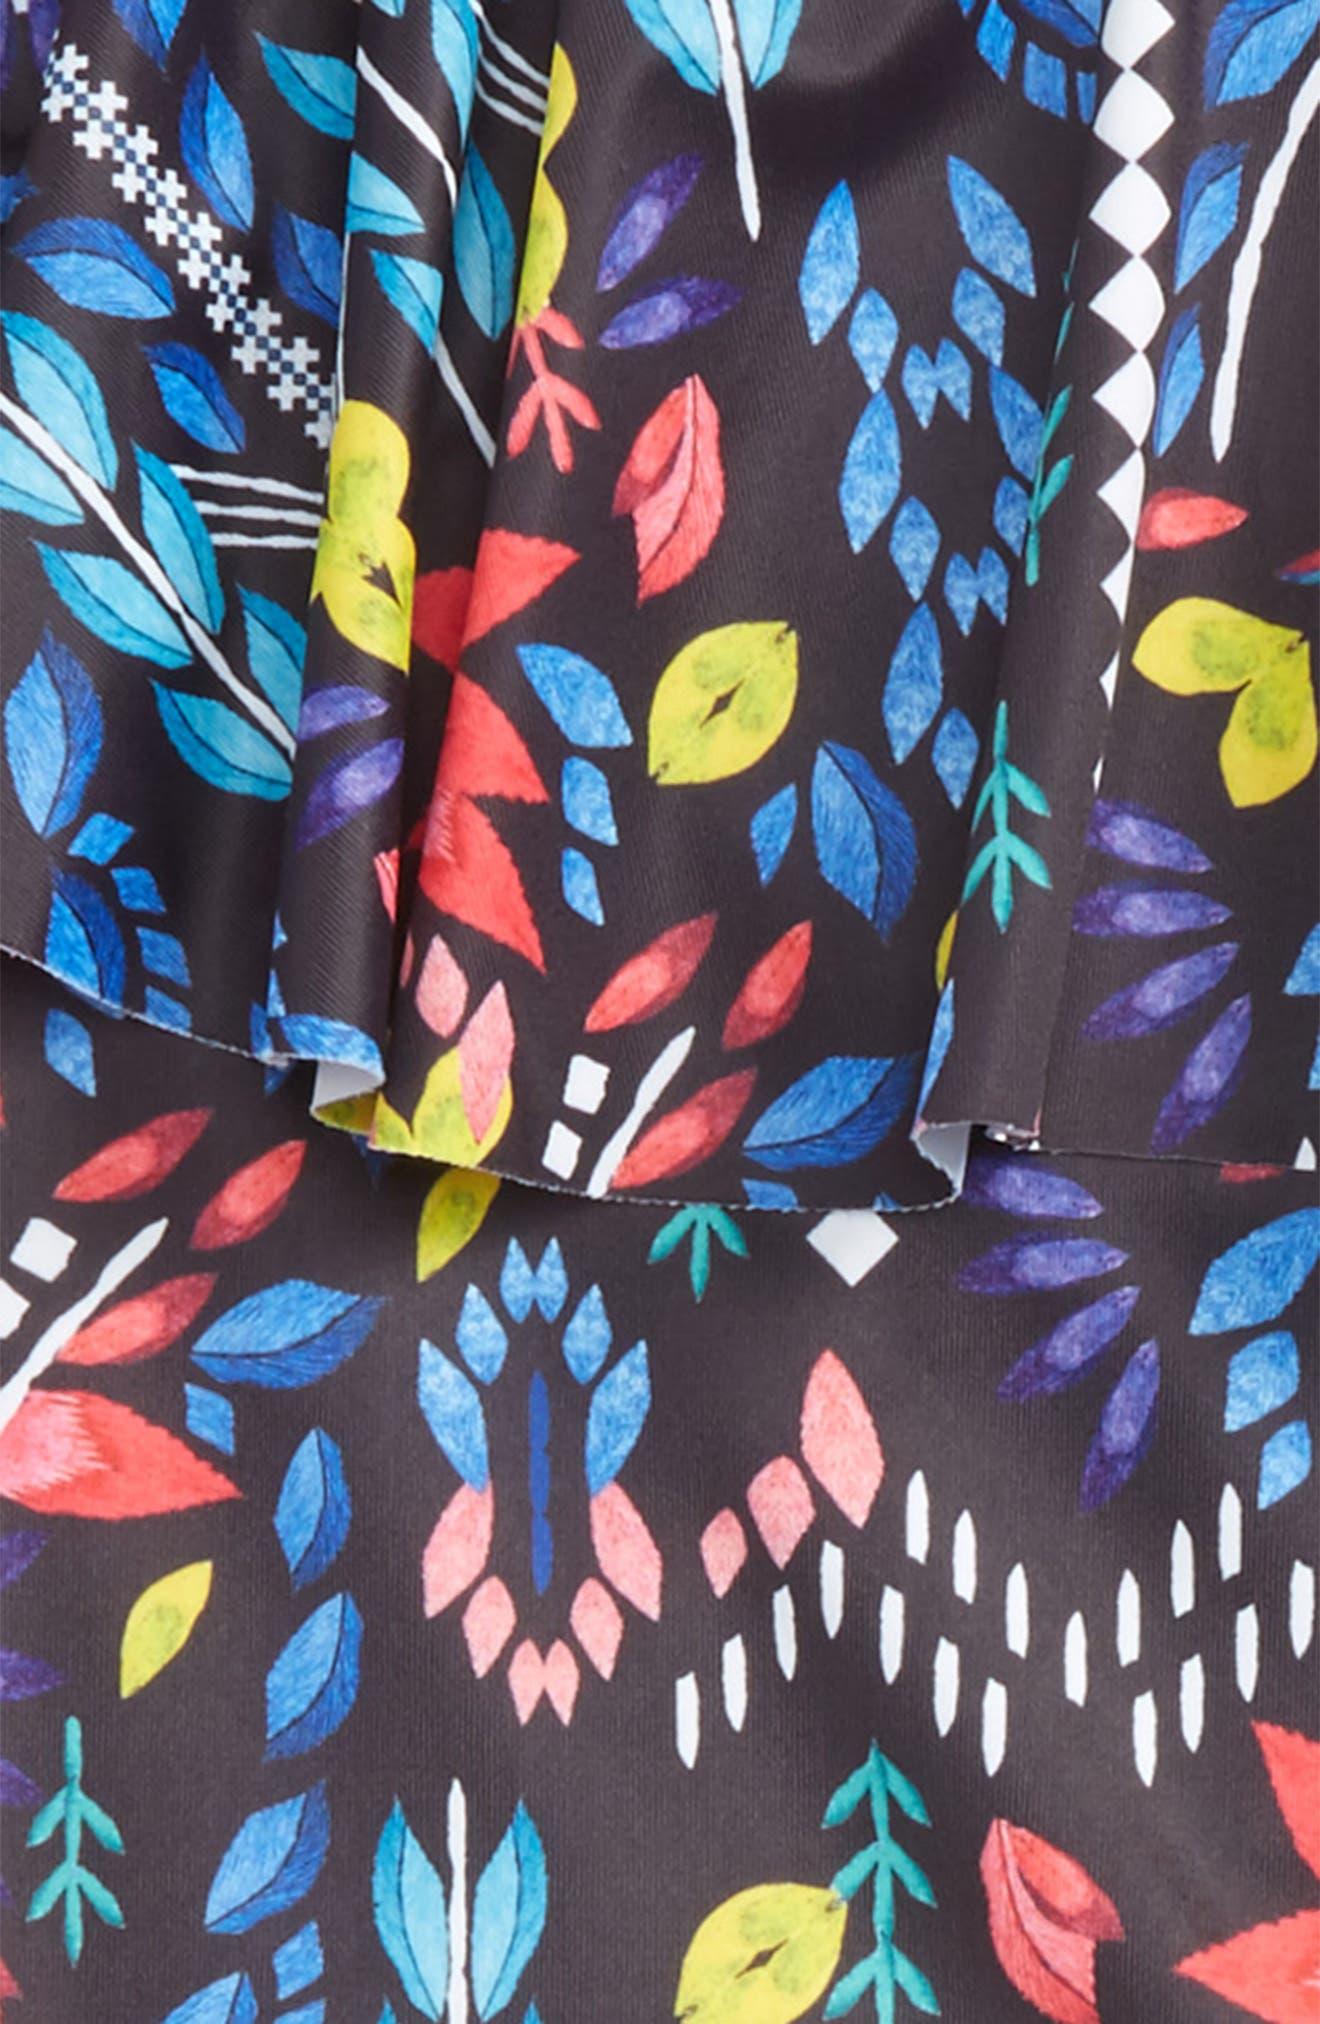 Mexicana Fiesta One-Piece Swimsuit,                             Alternate thumbnail 2, color,                             Black Multi